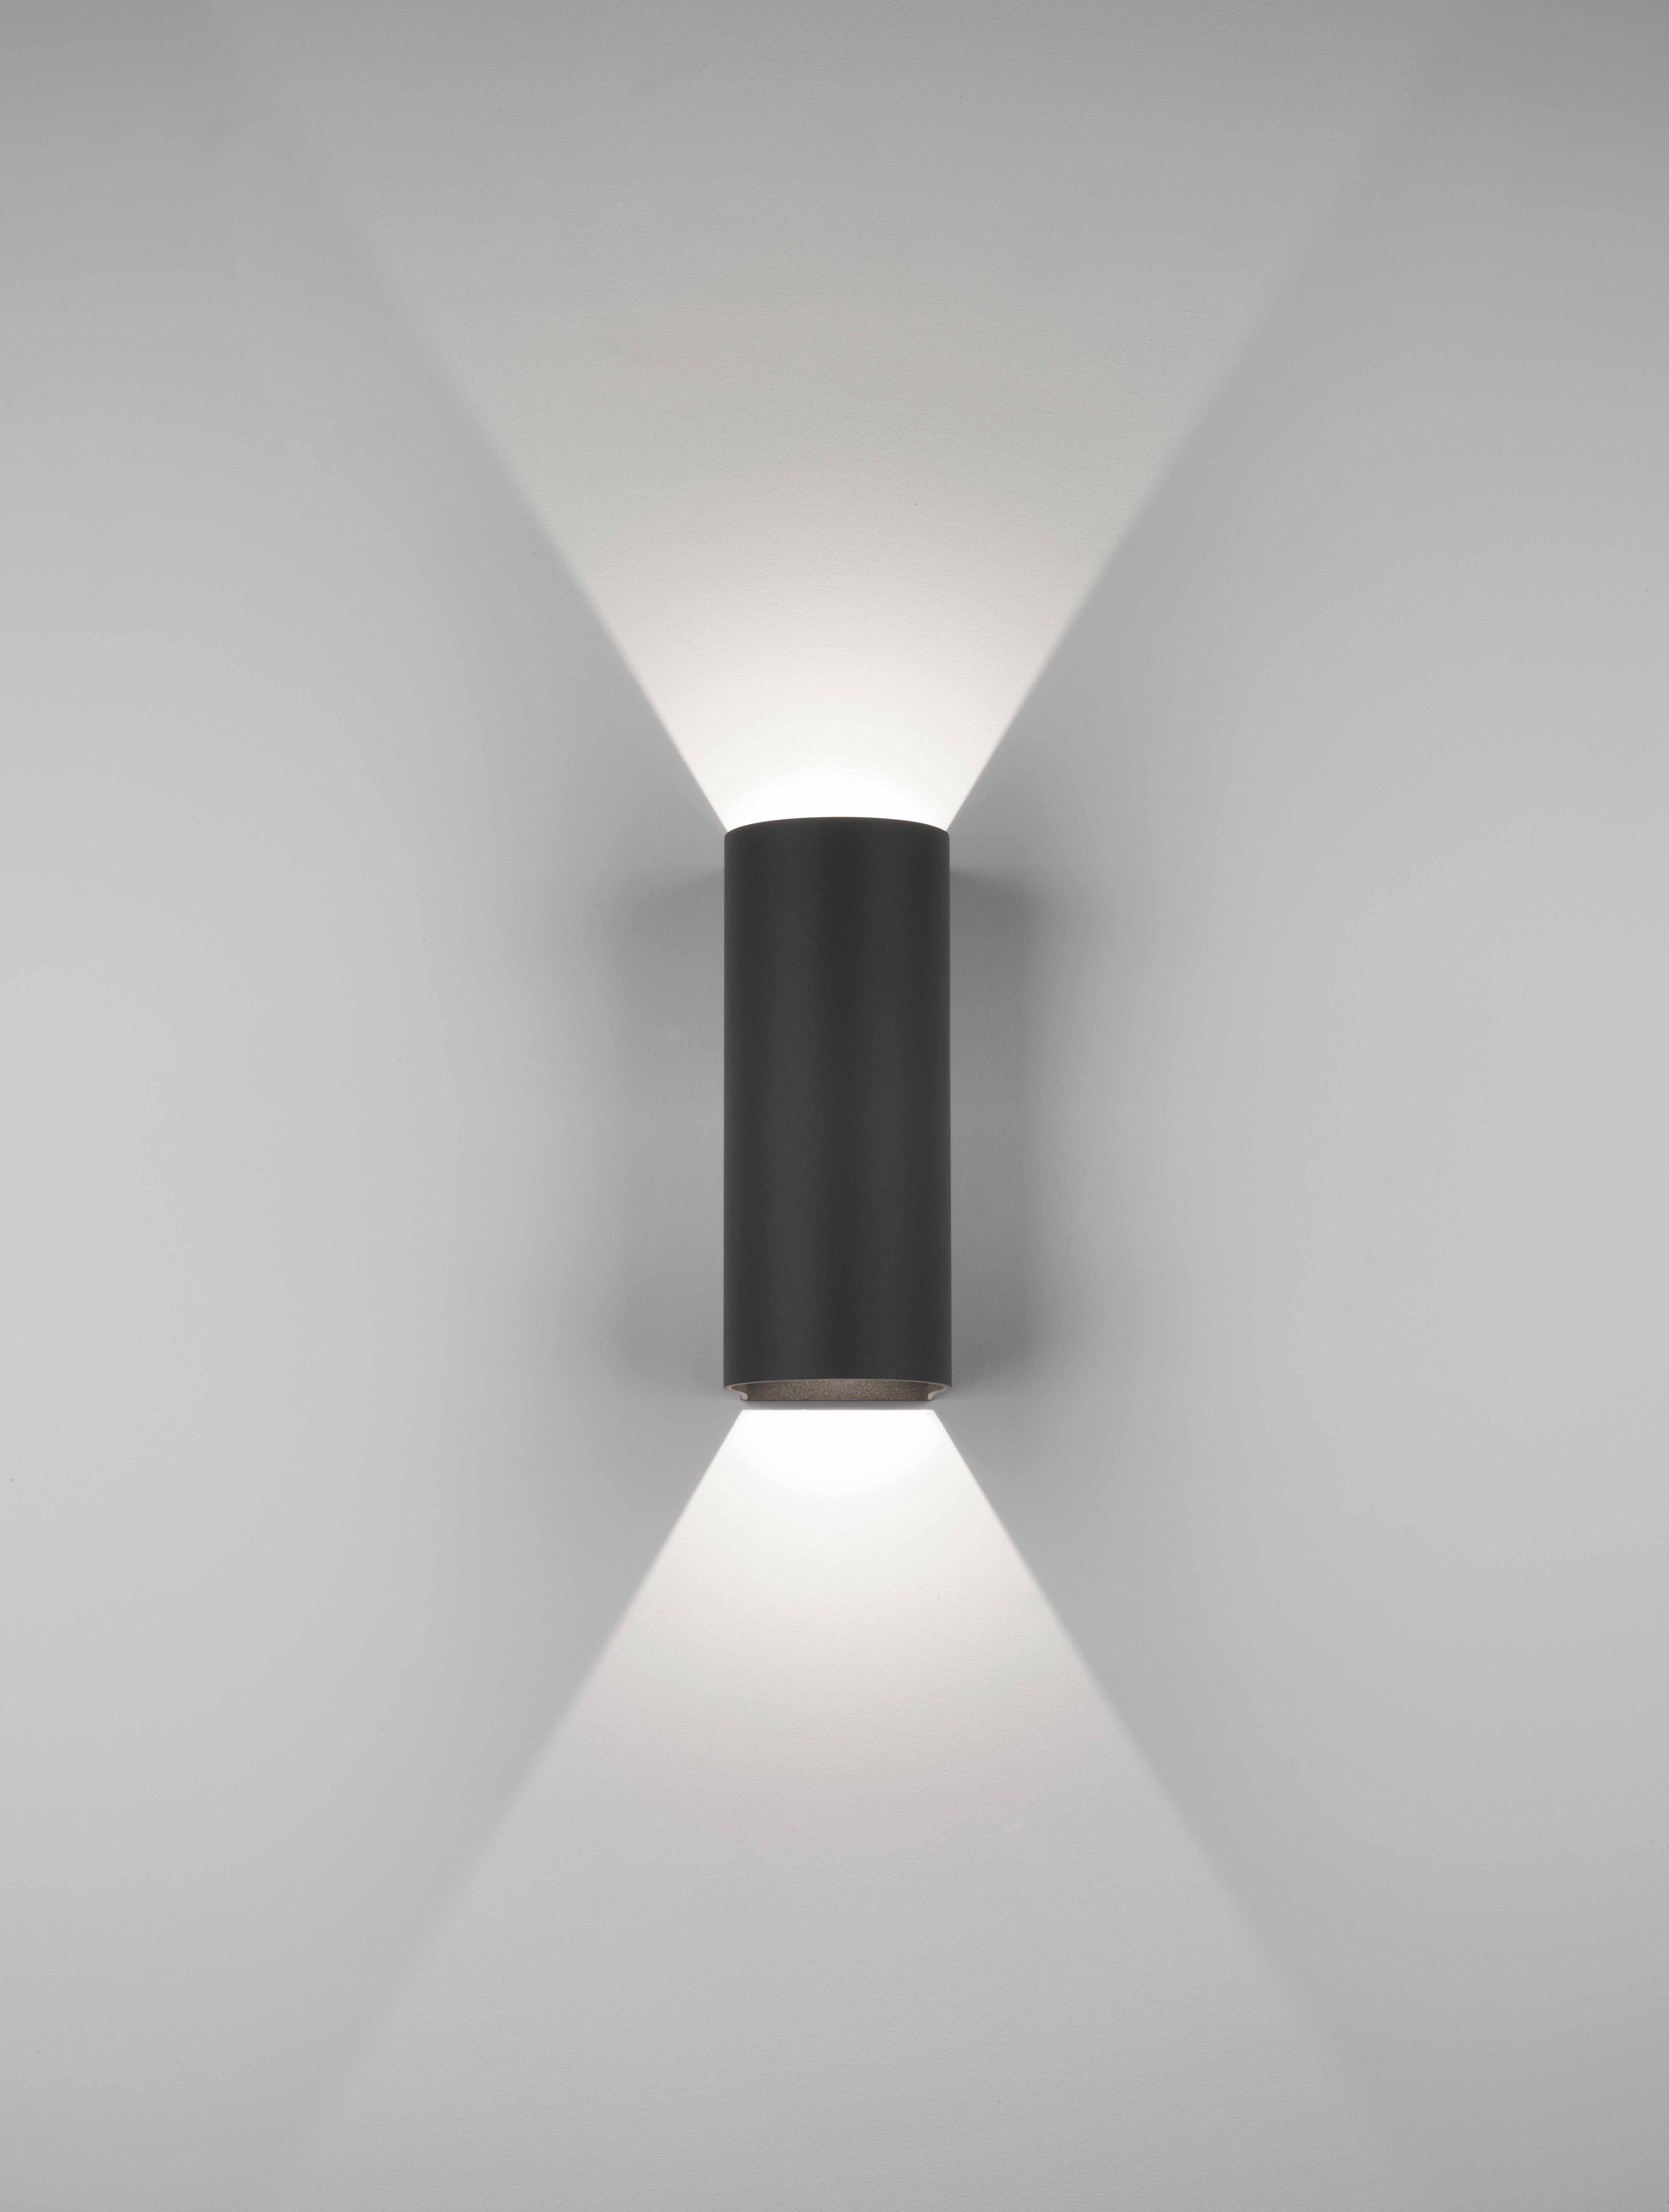 The Dunbar 255 7992 Exterior Wall Light By Astro Lighting